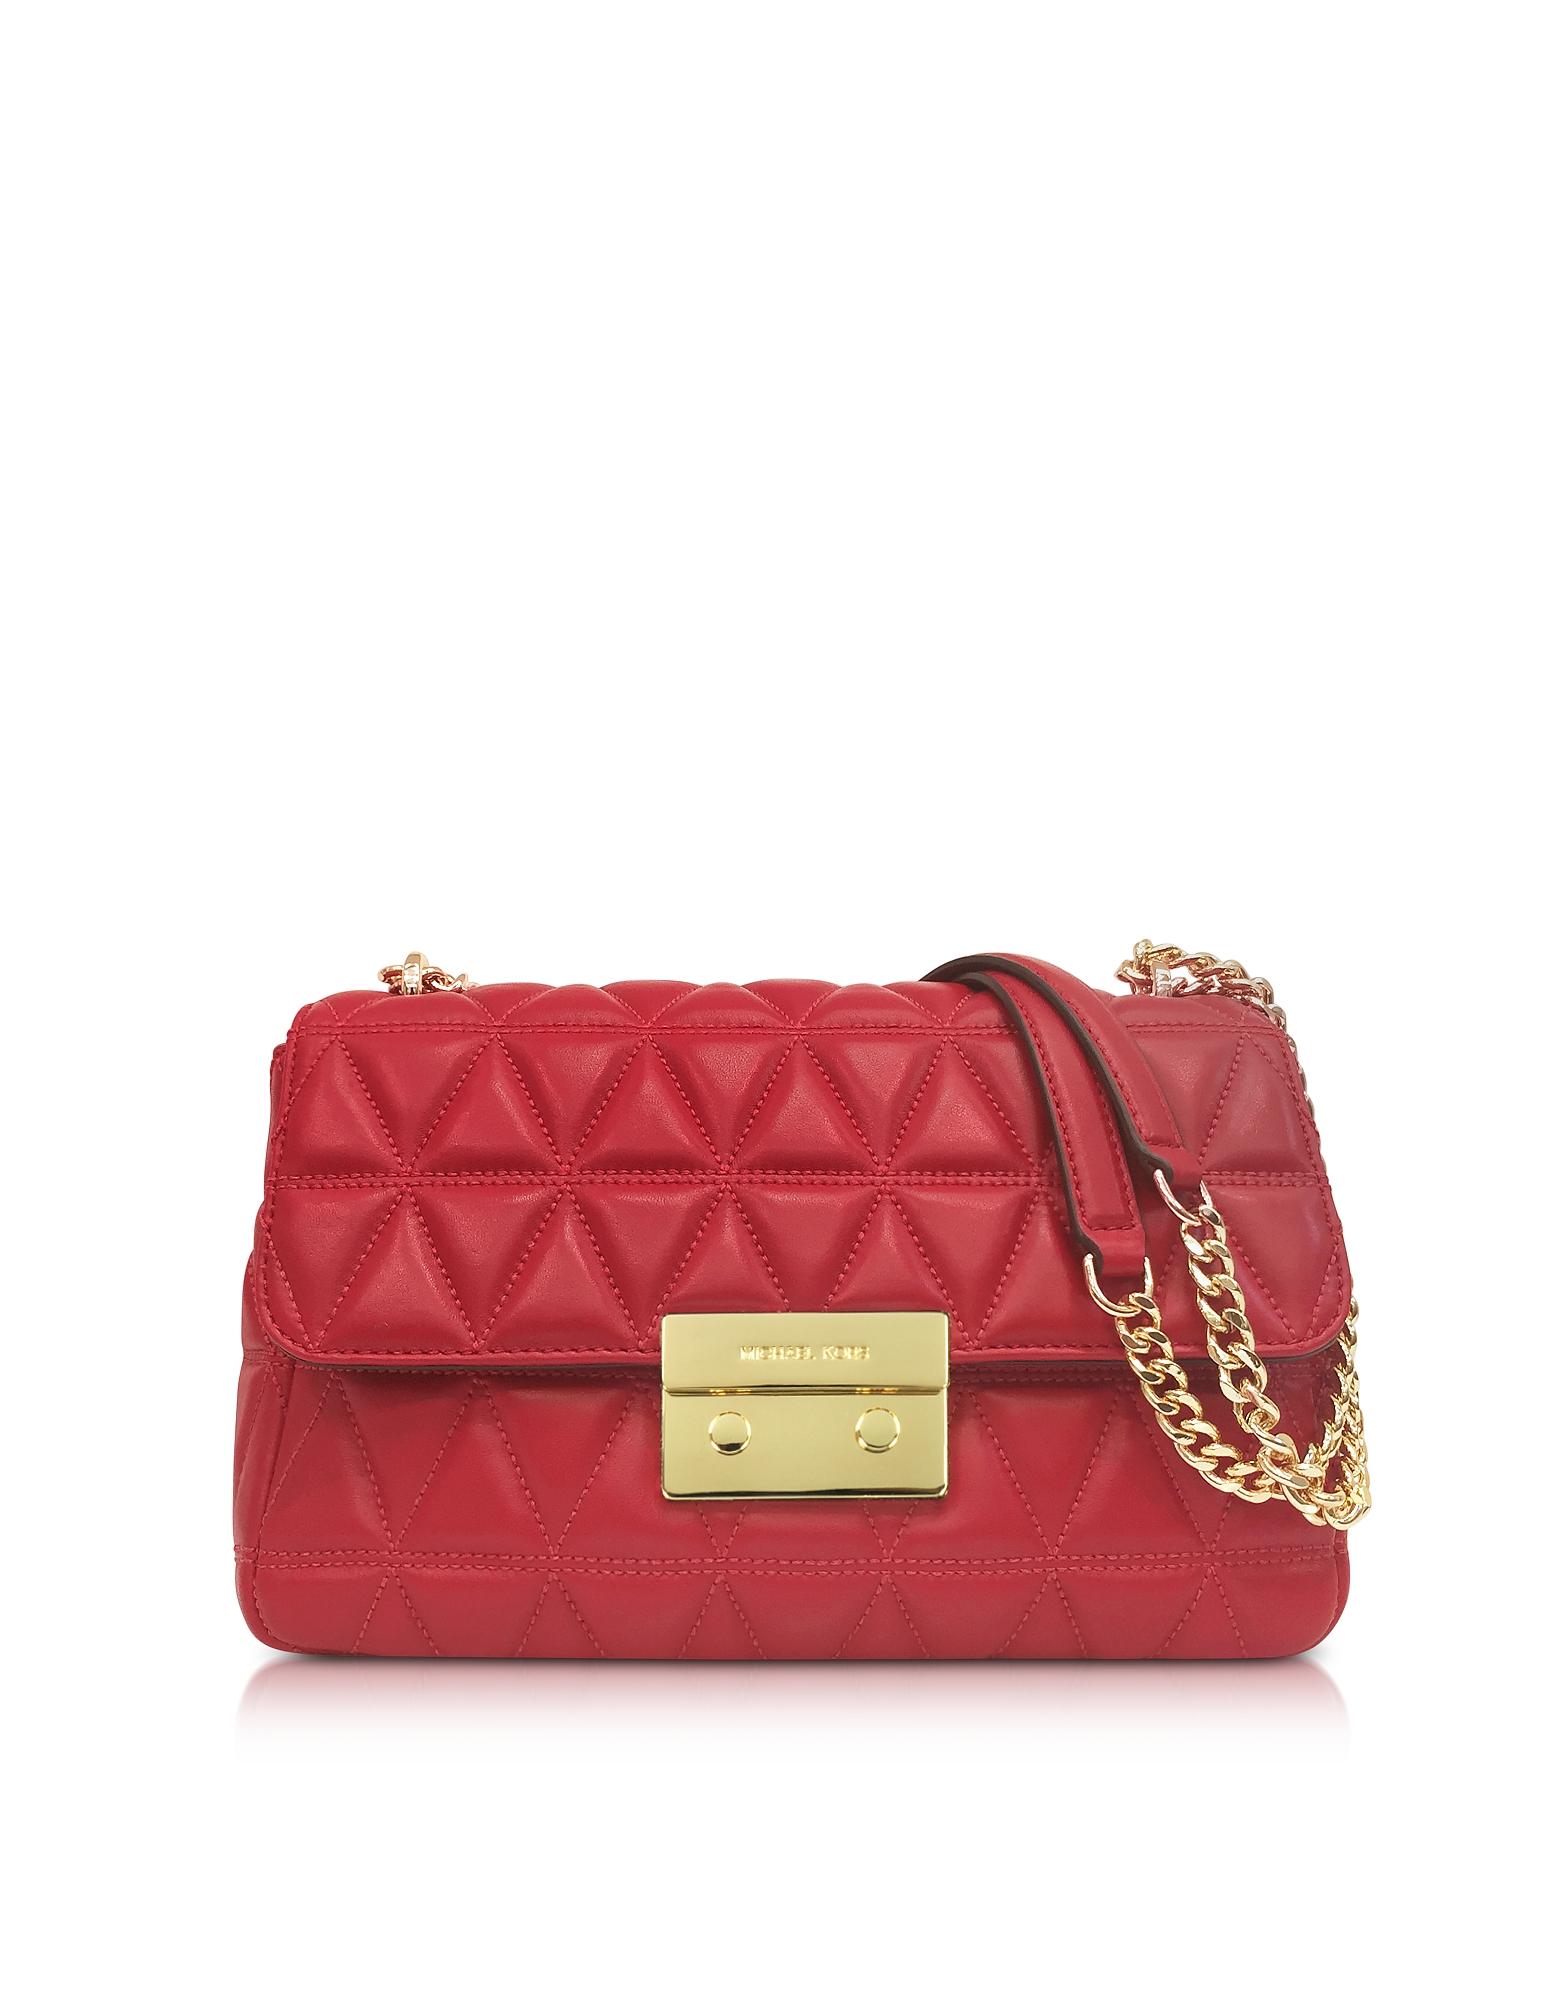 Michael Kors Handbags, Bright Red Sloan Large Quilted-Leather Shoulder Bag